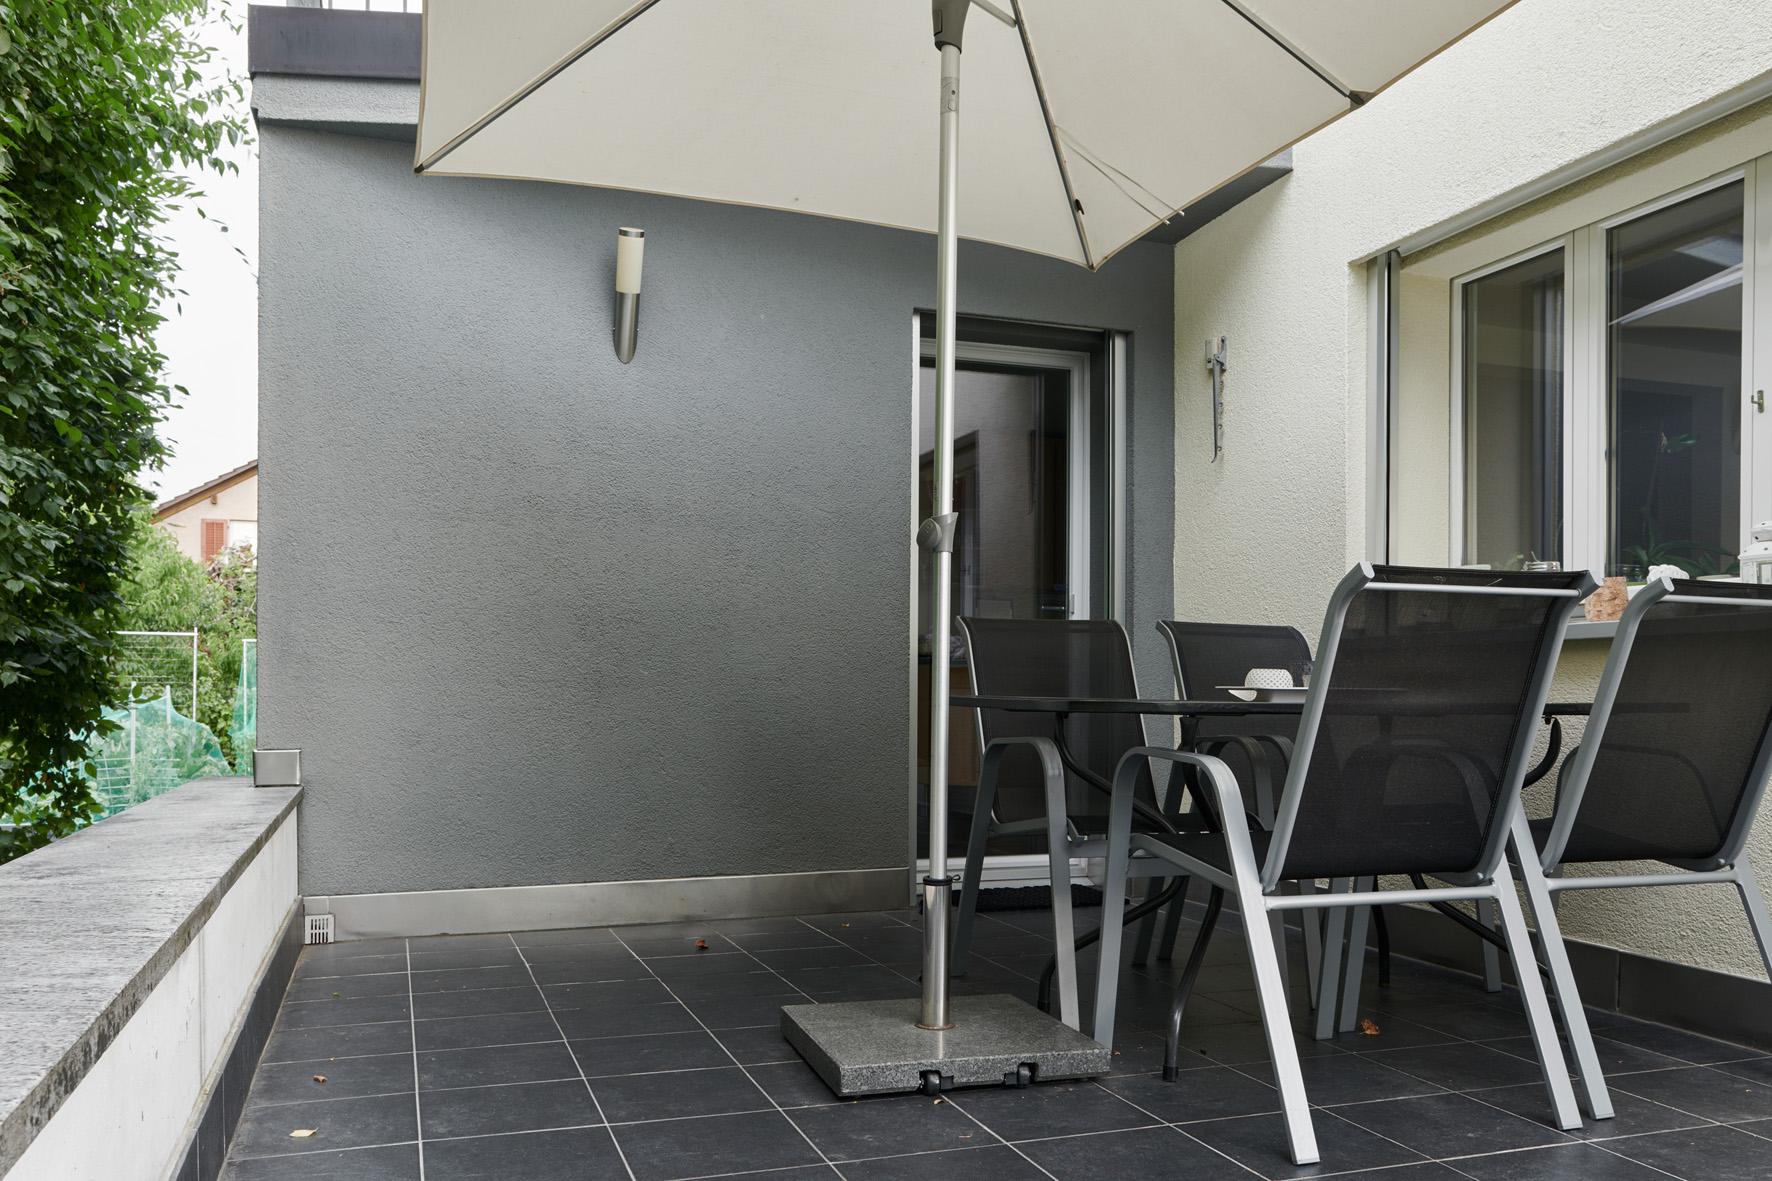 7 Zimmer Einfamilienhaus In Suhr - Immobilien - Momentum Immobilien Ag